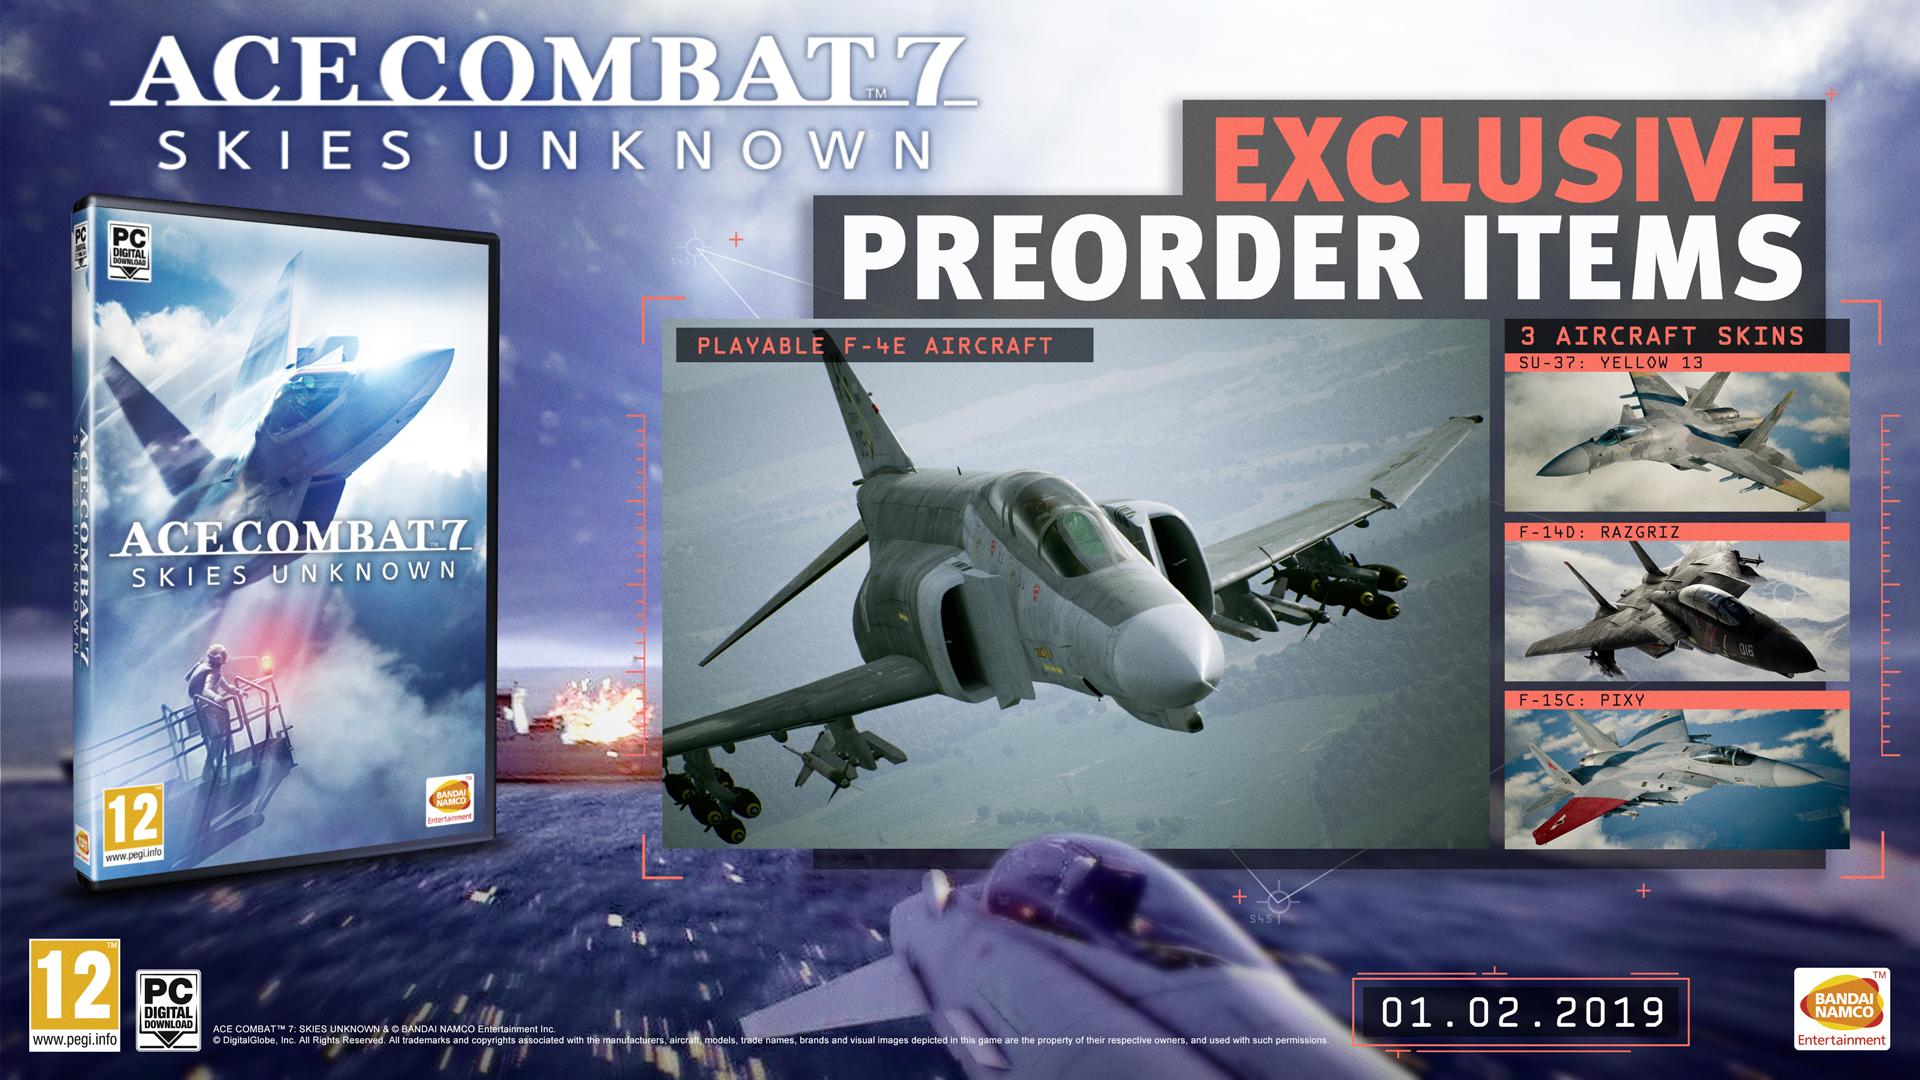 Ace Combat 7: Skies Unknown Pre-Order Bonuses, Season Pass